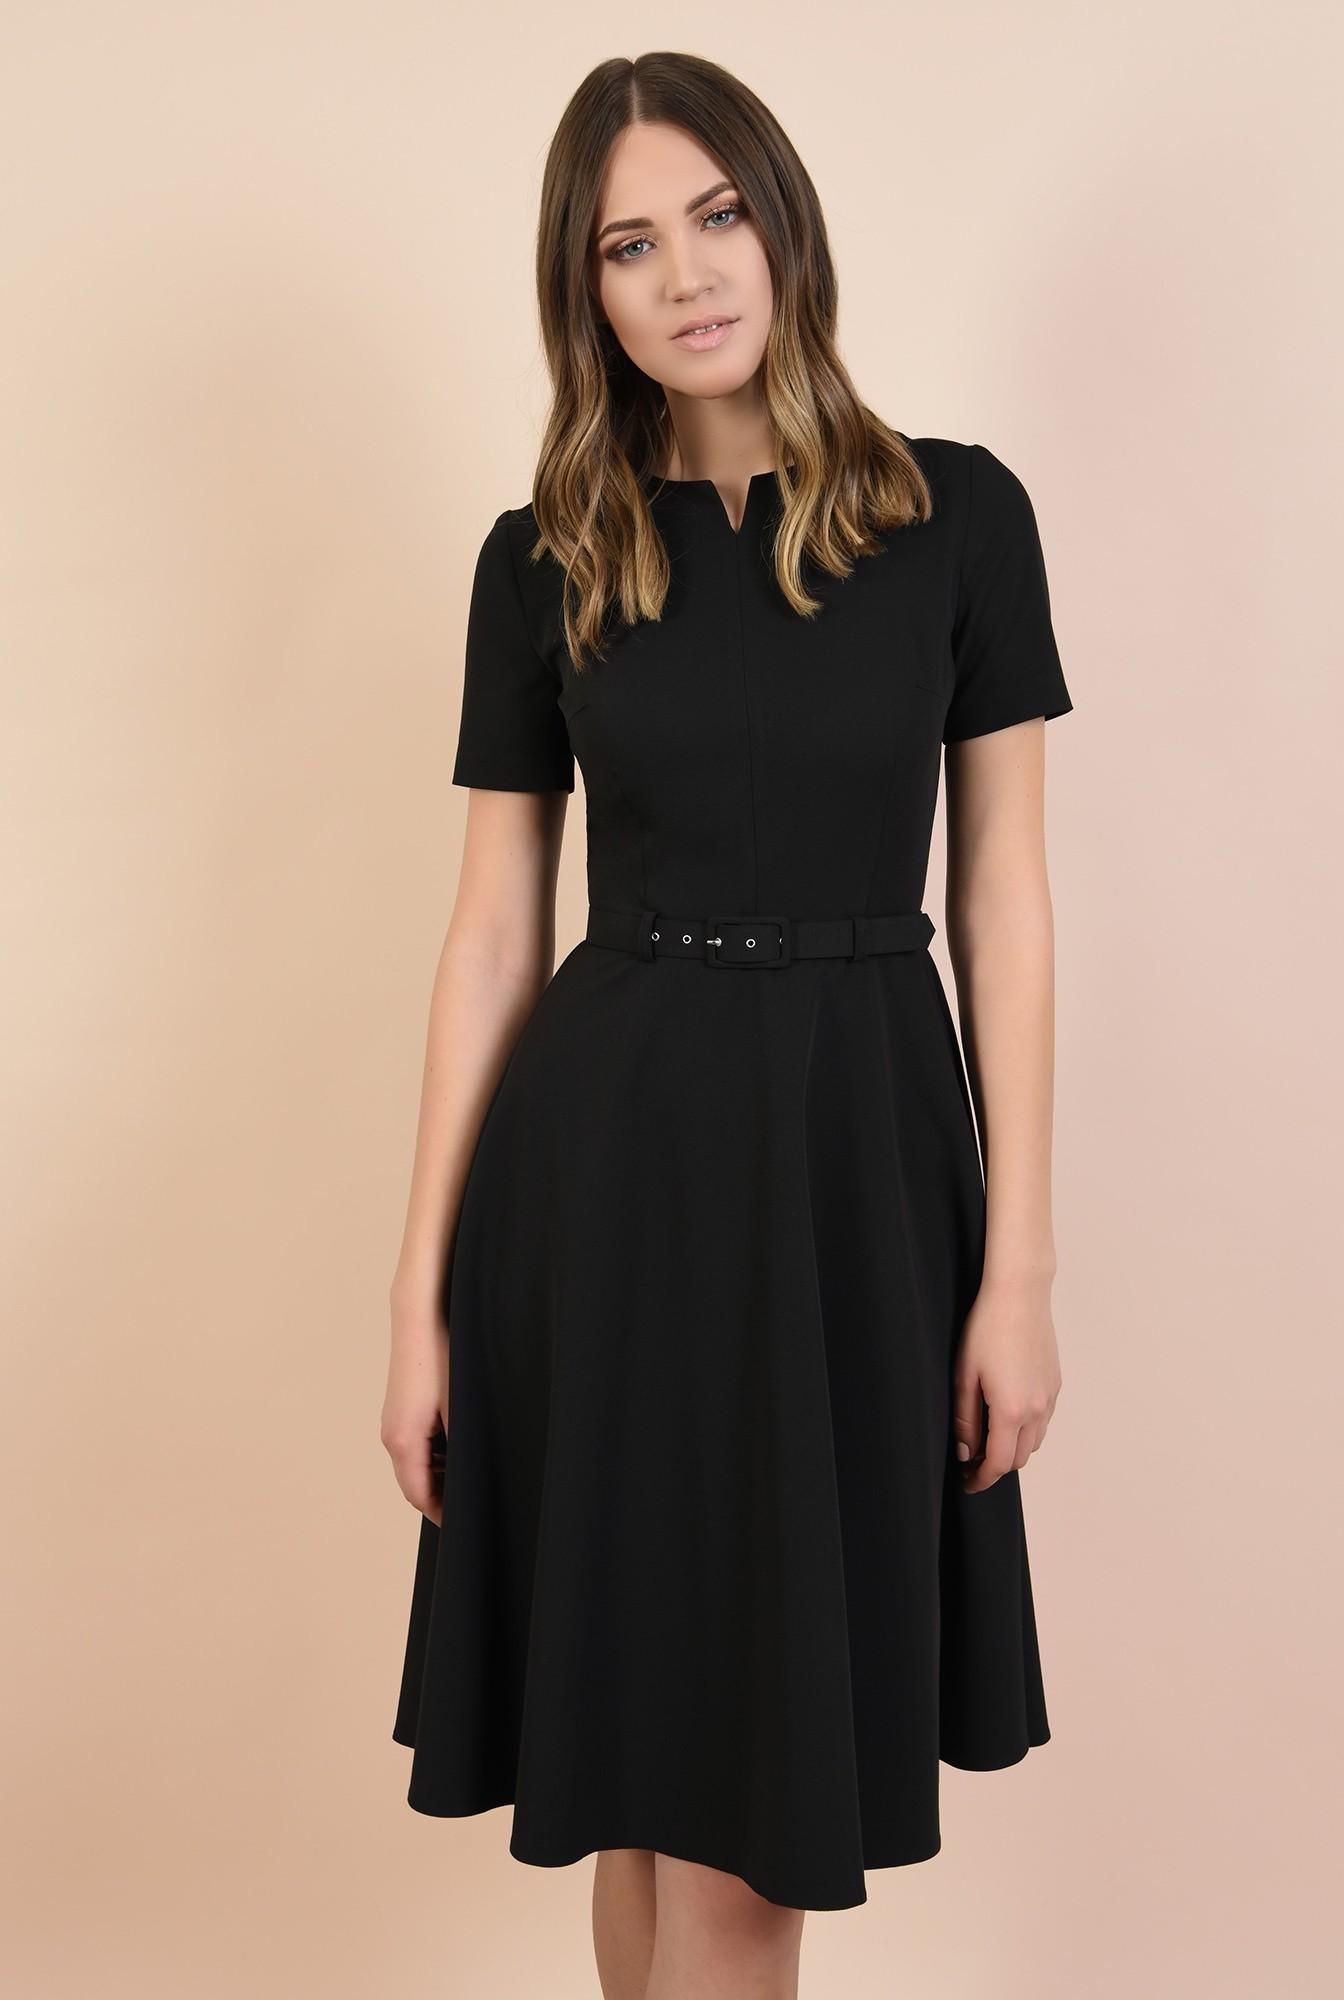 2 - rochie neagra, midi, bie, maneci scurte, decolteu la baza gatului